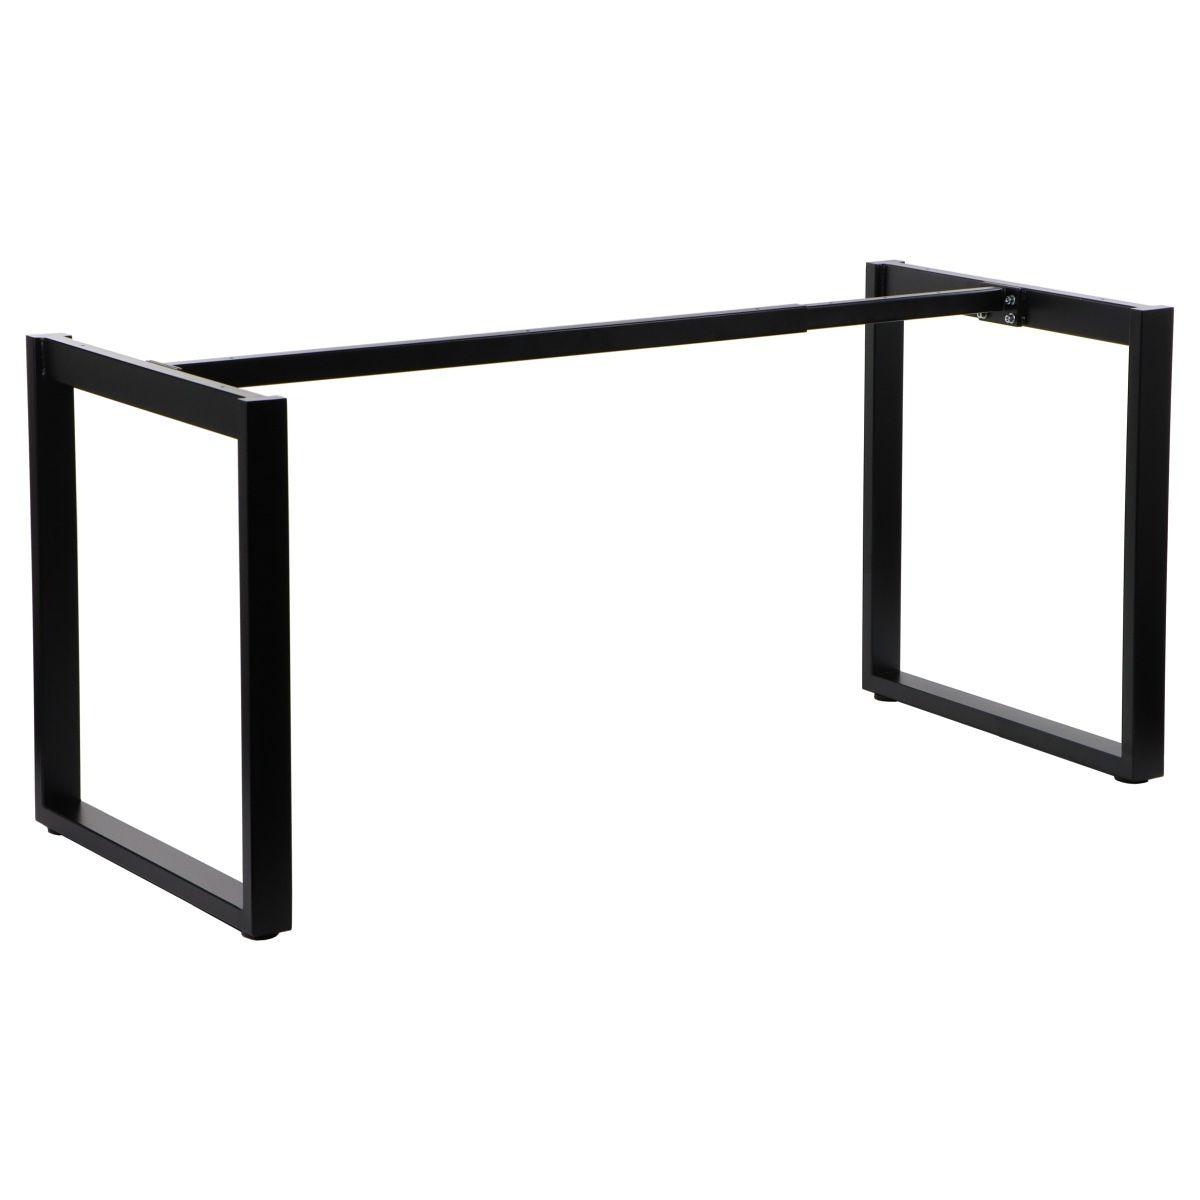 Stelaż skręcany do stołu i biurka EF-NY-131 czarny 139,6x69,6 cm